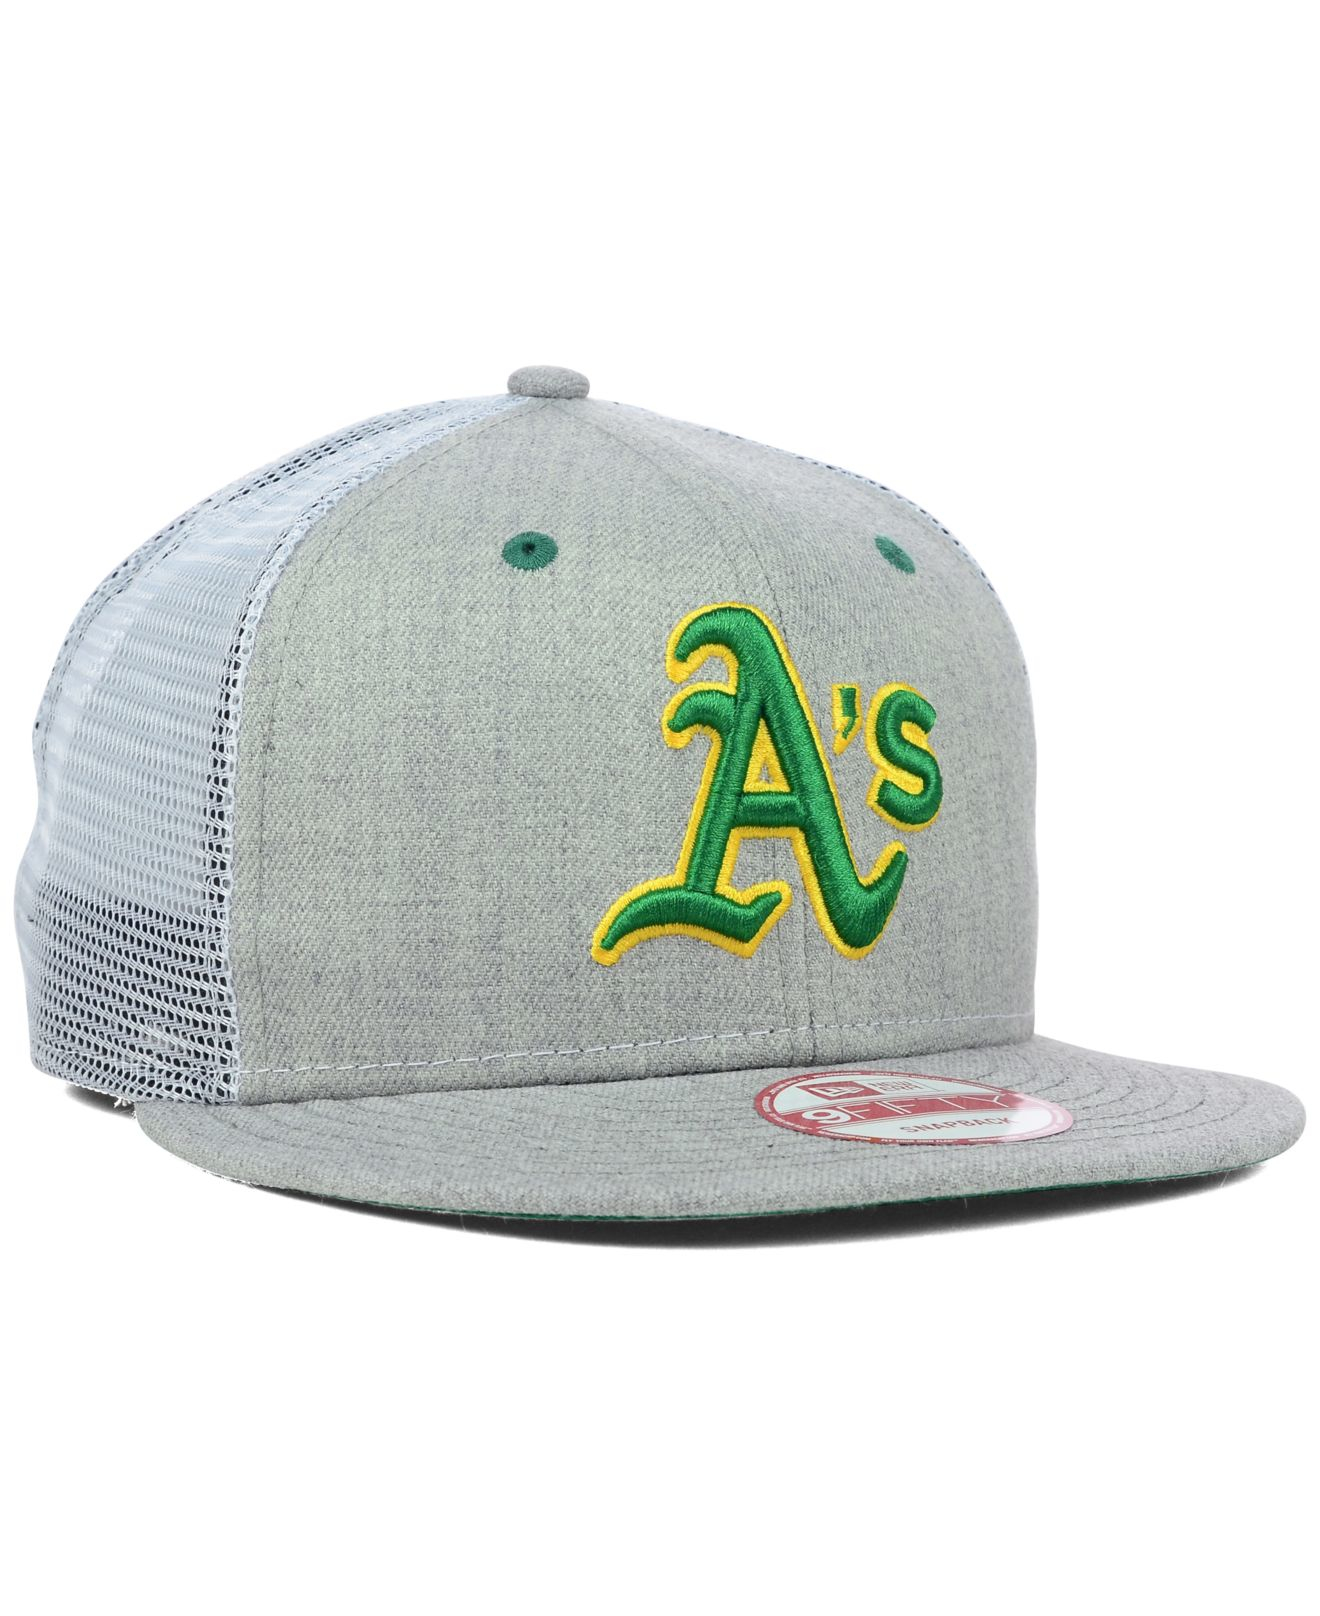 reputable site 8c493 d19a8 KTZ Oakland Athletics Heather Trucker 9fifty Snapback Cap in Gray ...